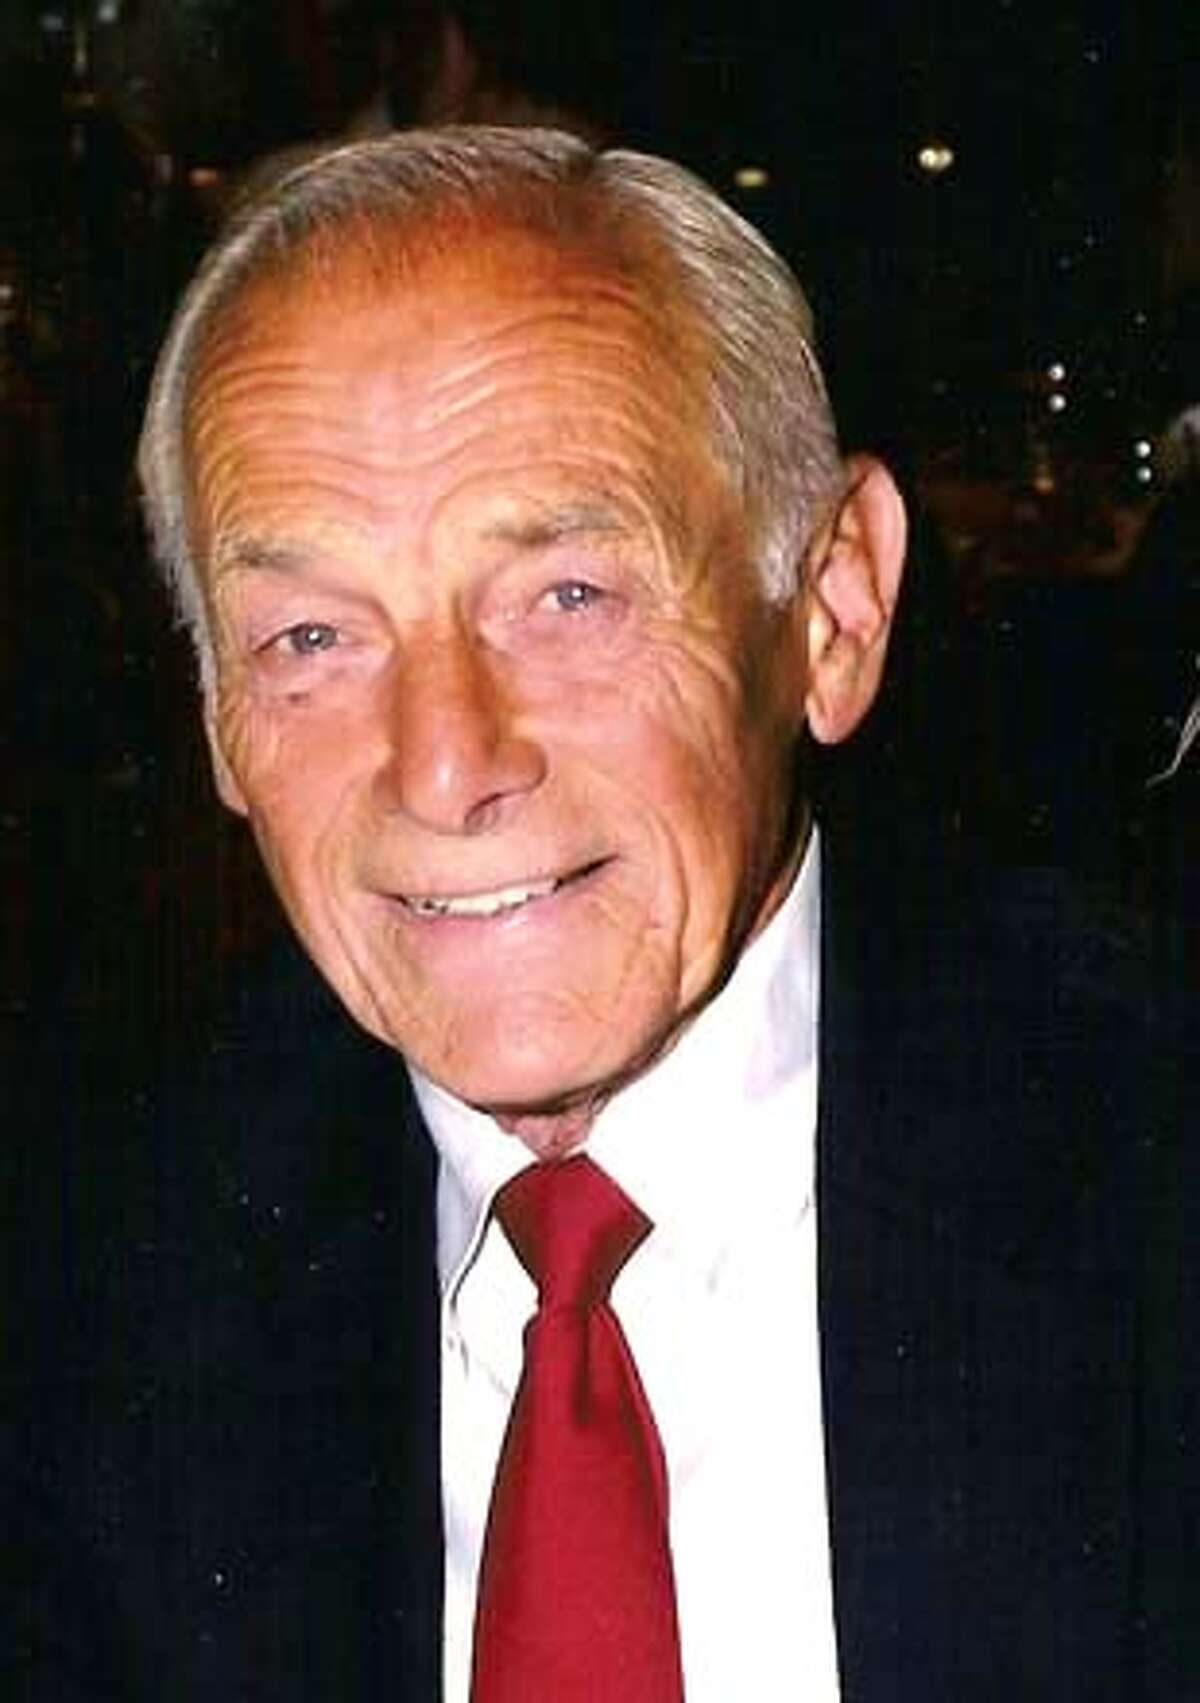 Obituary photo of Anatole Balmy.